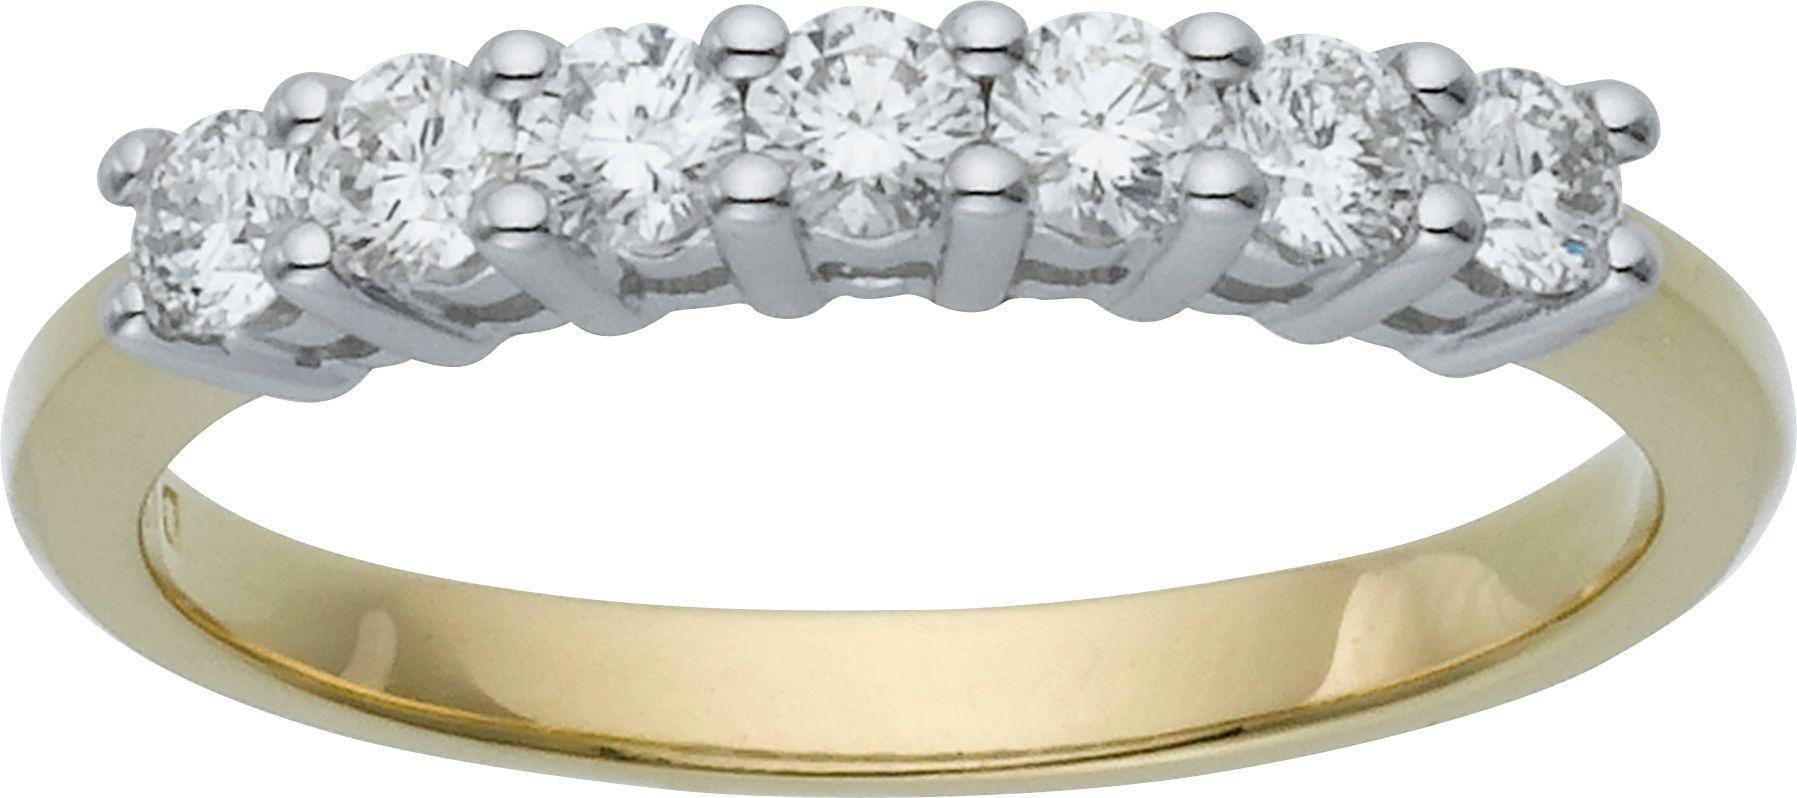 Buy Everlasting Love 9ct Gold 7 Stone Eternity Ring Size V at